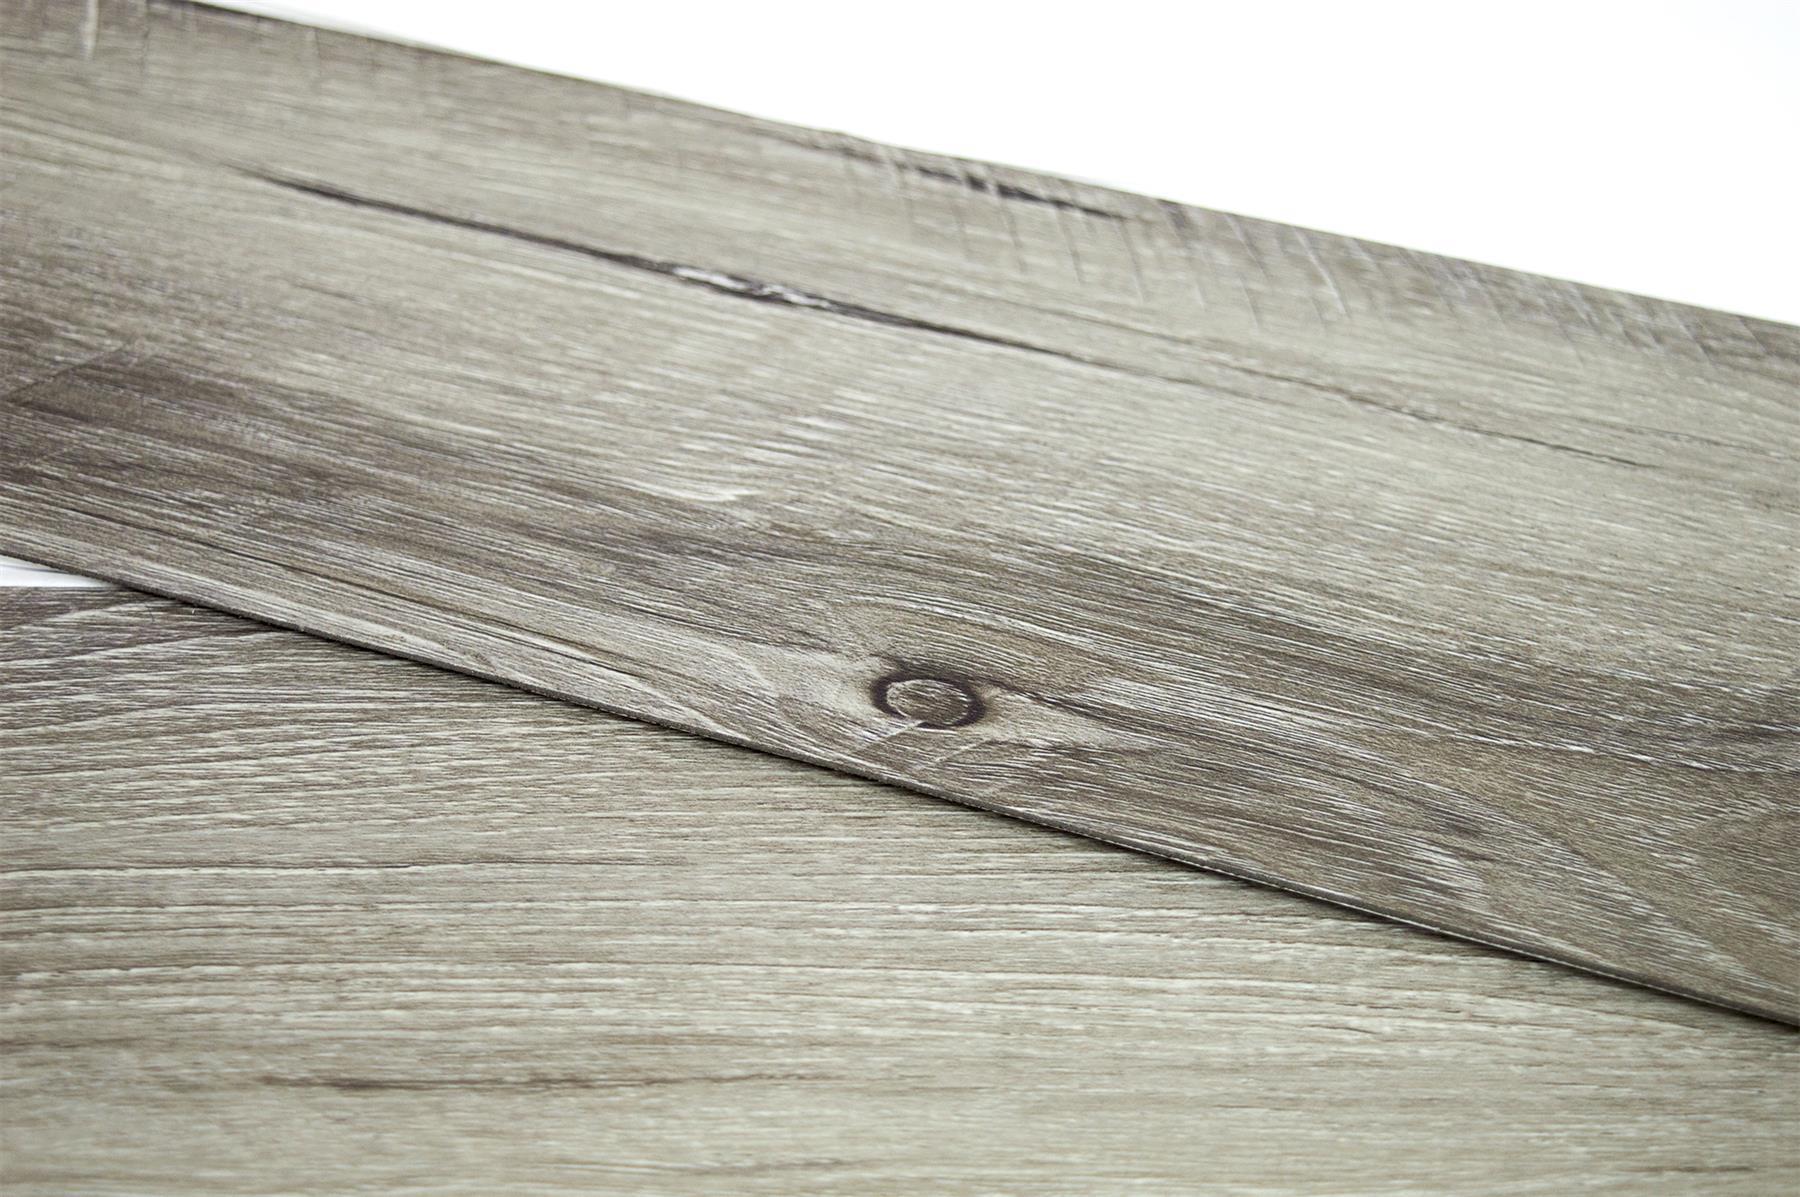 thumbnail 17 - Floor Planks Tiles Self Adhesive Dark Grey Wood Vinyl Flooring Kitchen Bathroom